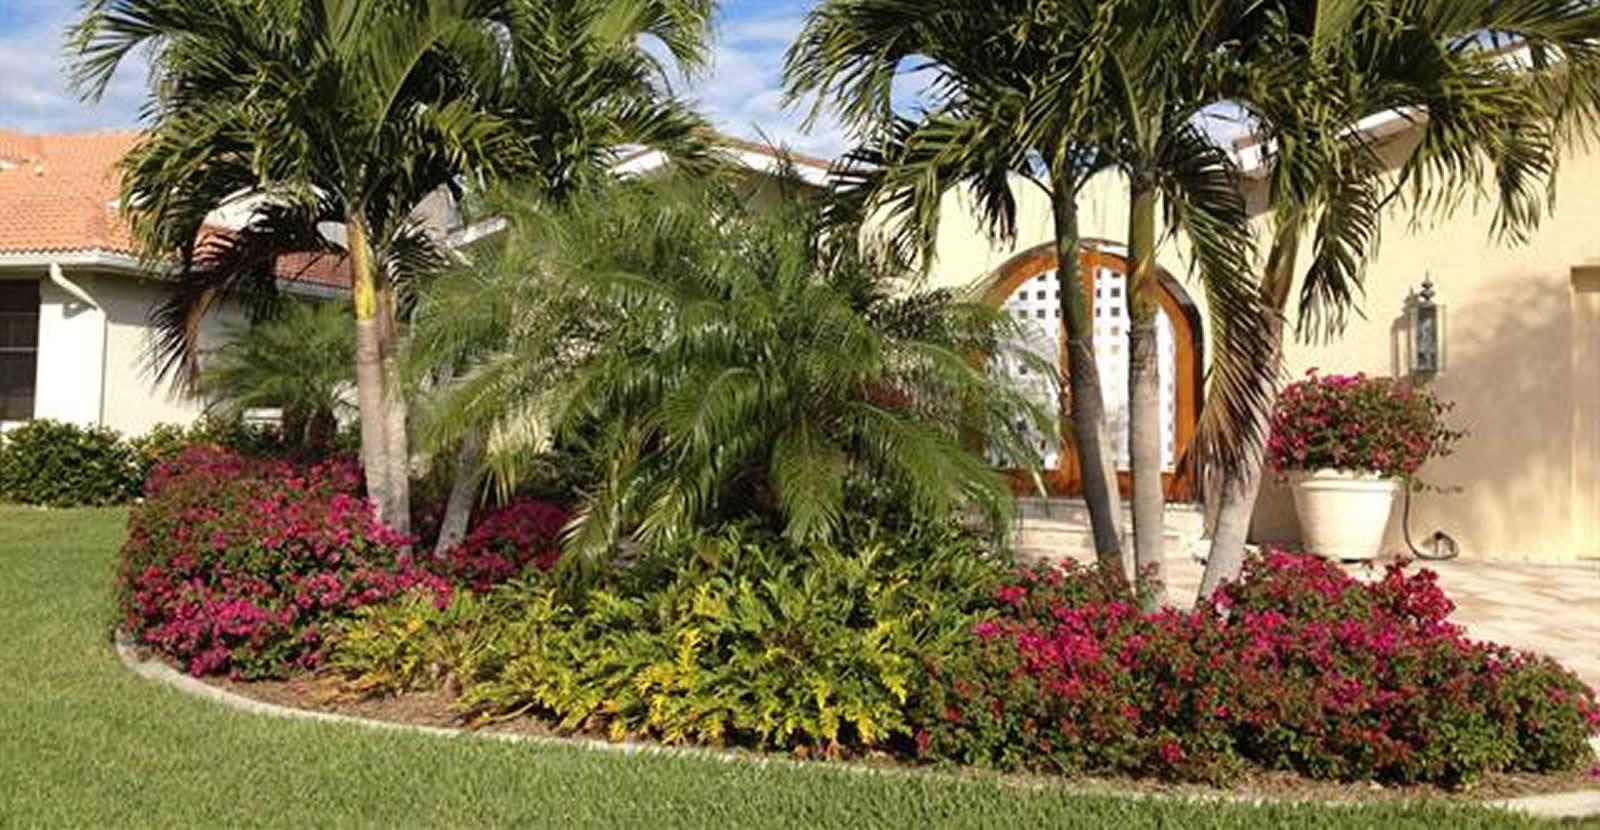 Craigs Perfect Turf Landscaping Port Charlotte Florida